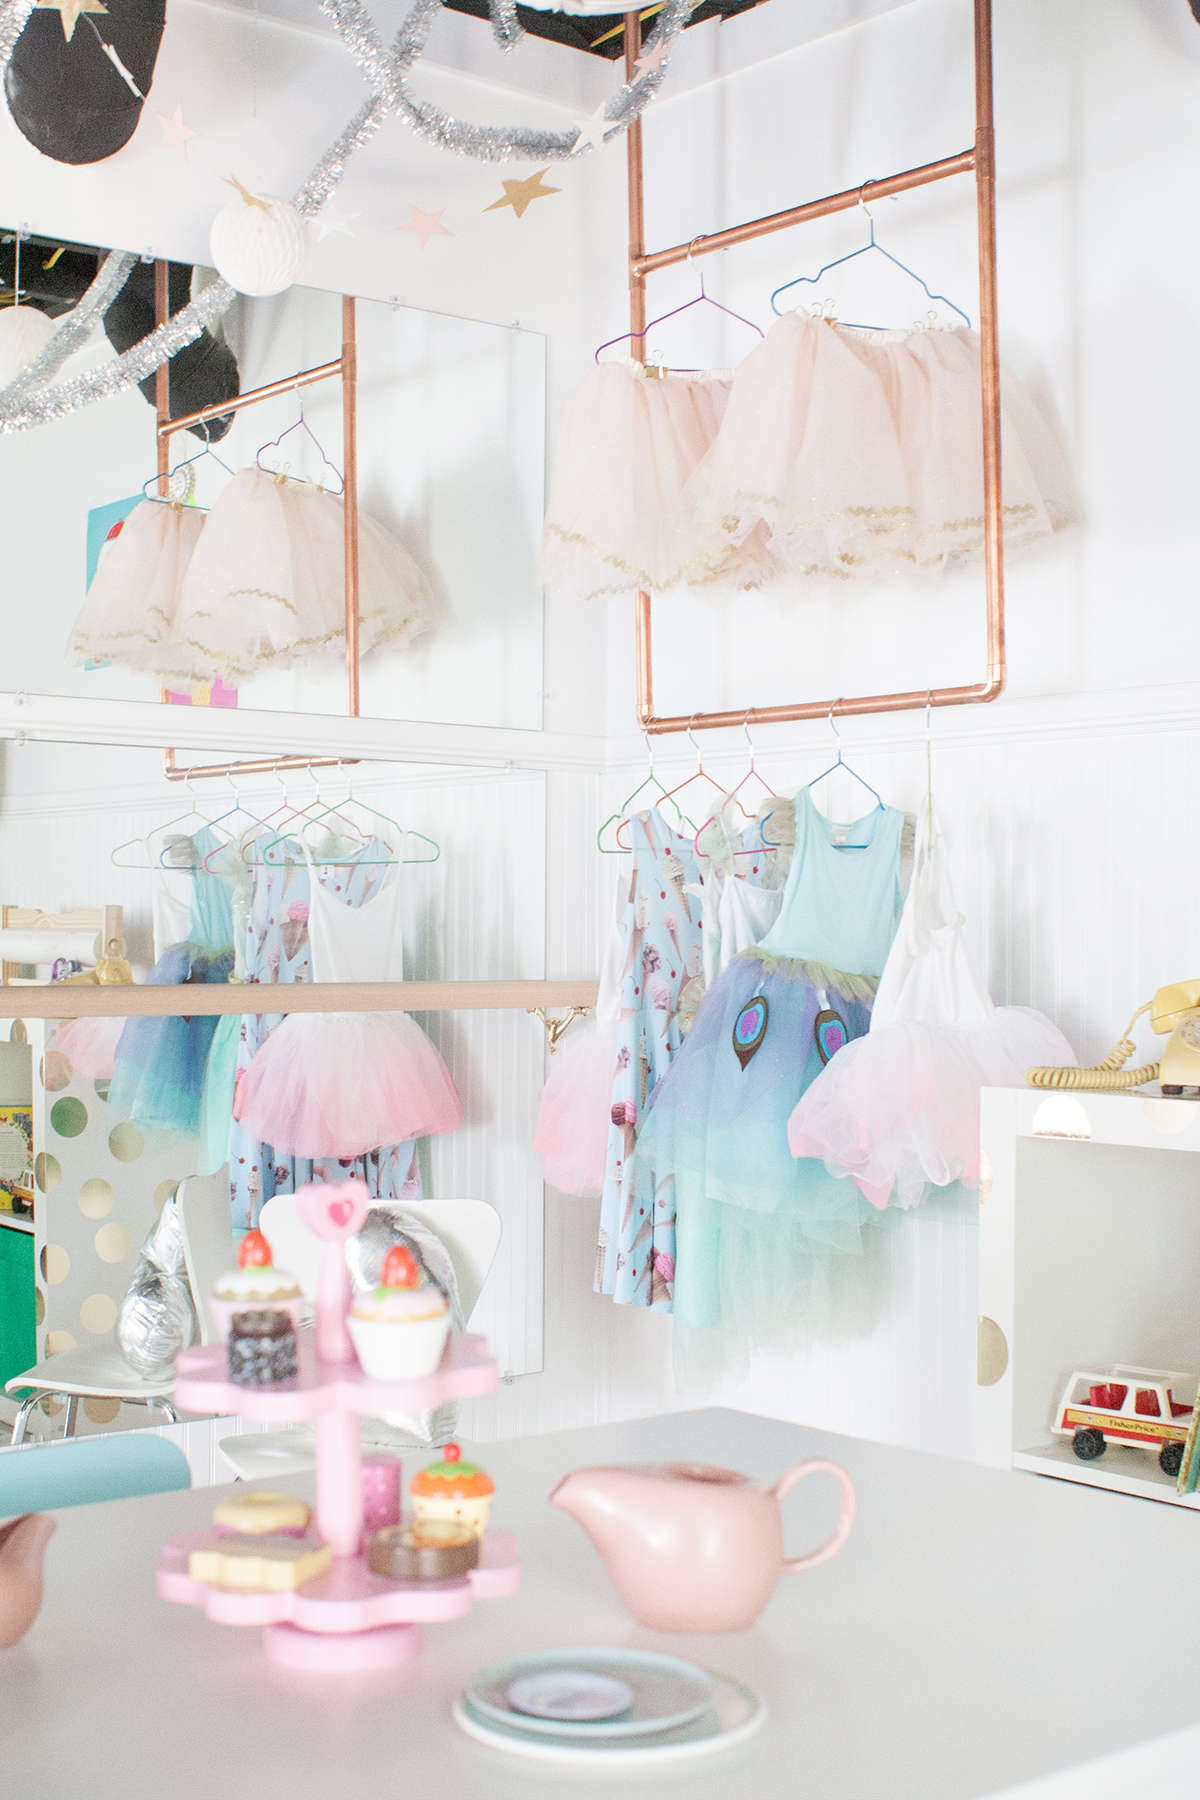 Simple Diy Ballet Barre For Playroom Lay Baby Lay Lay